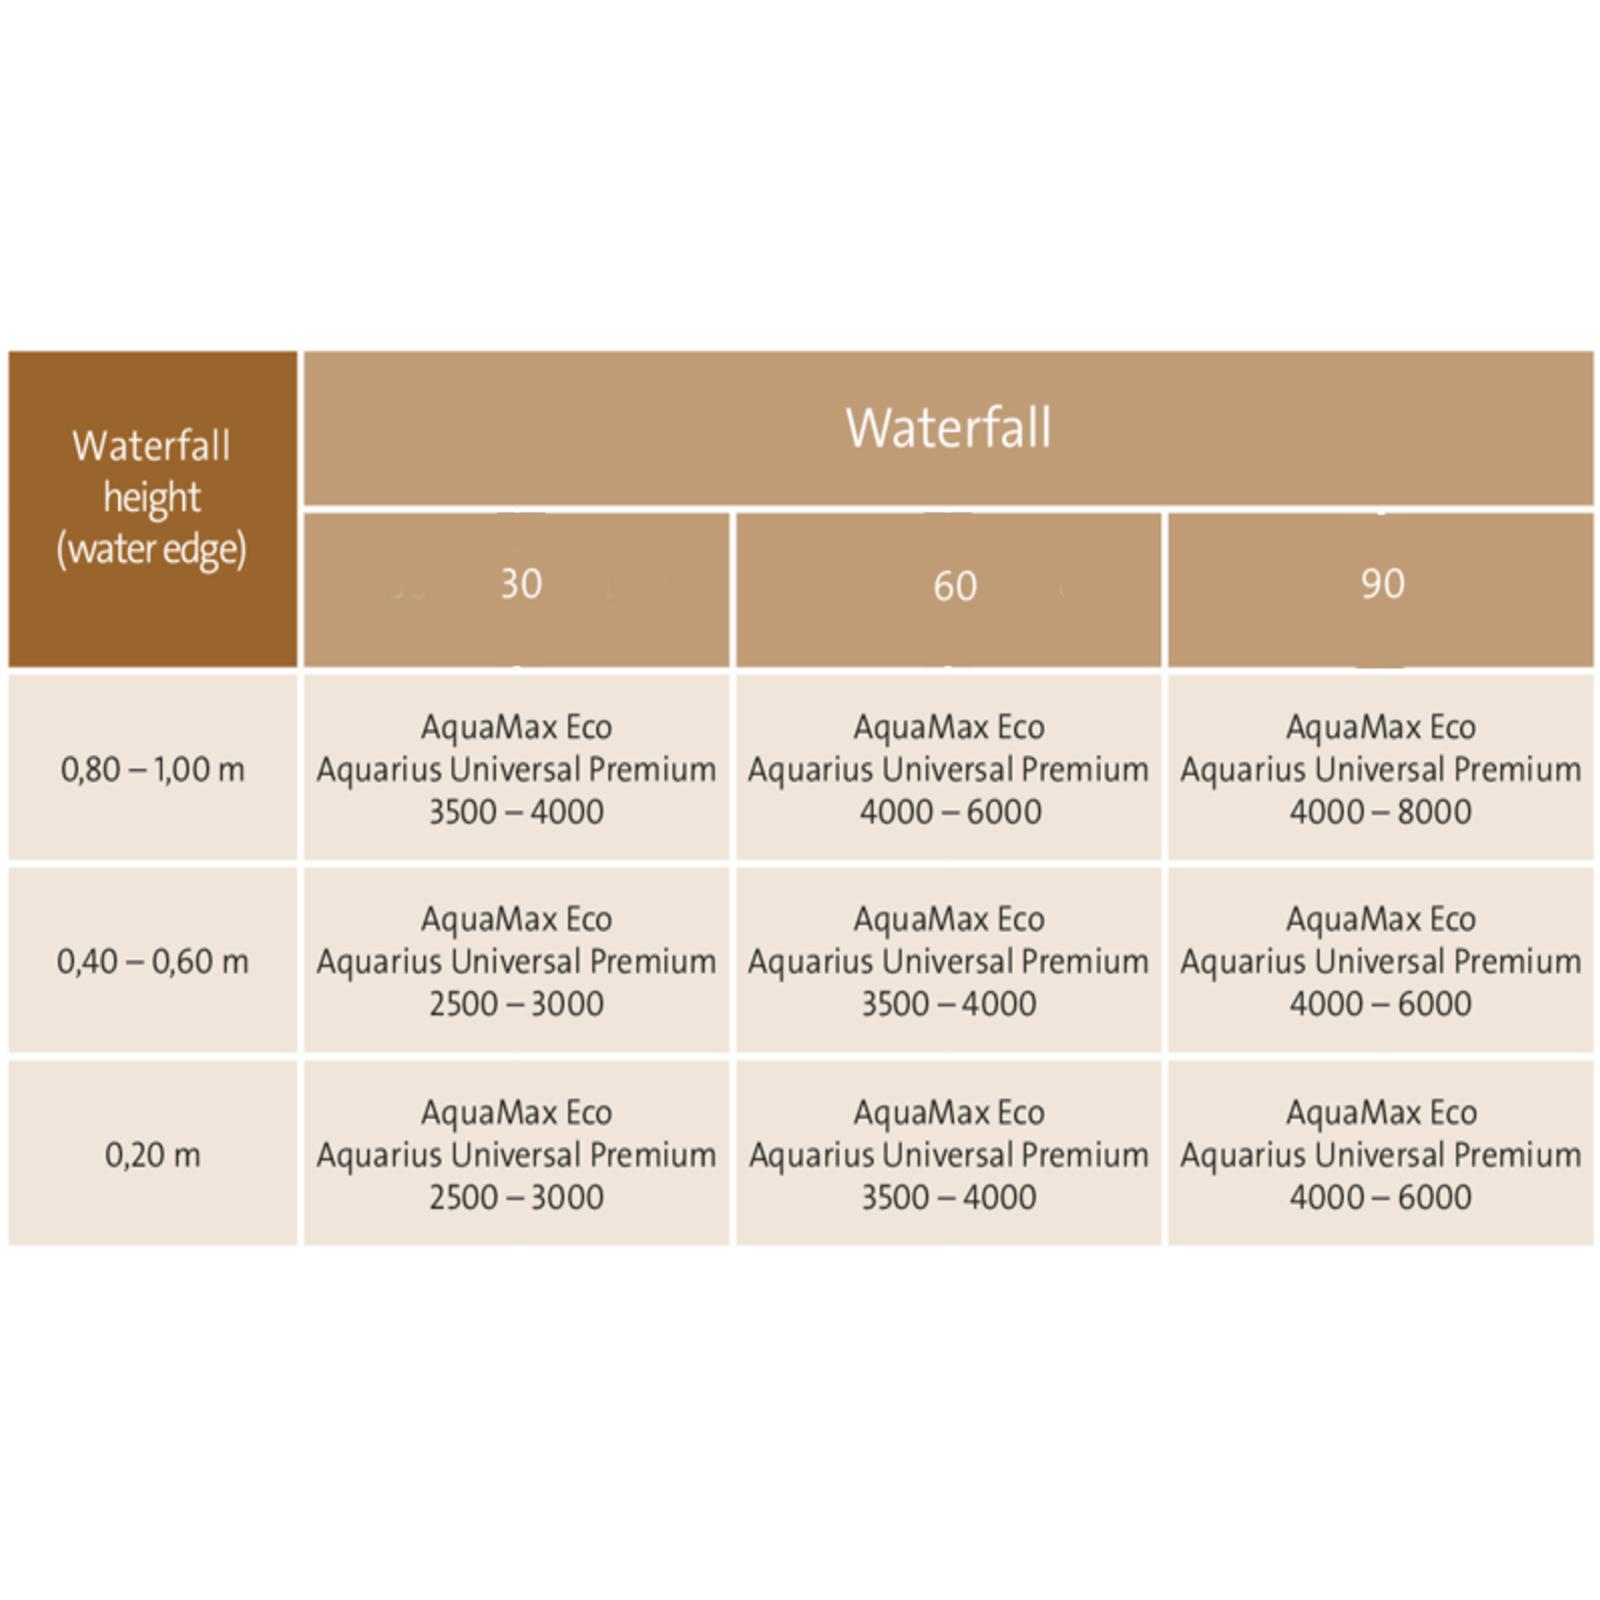 OASE POND WATERFALL BLADE 30 GARDEN CASCADE WATER FEATURE ILLUMINATION LED LIGHT